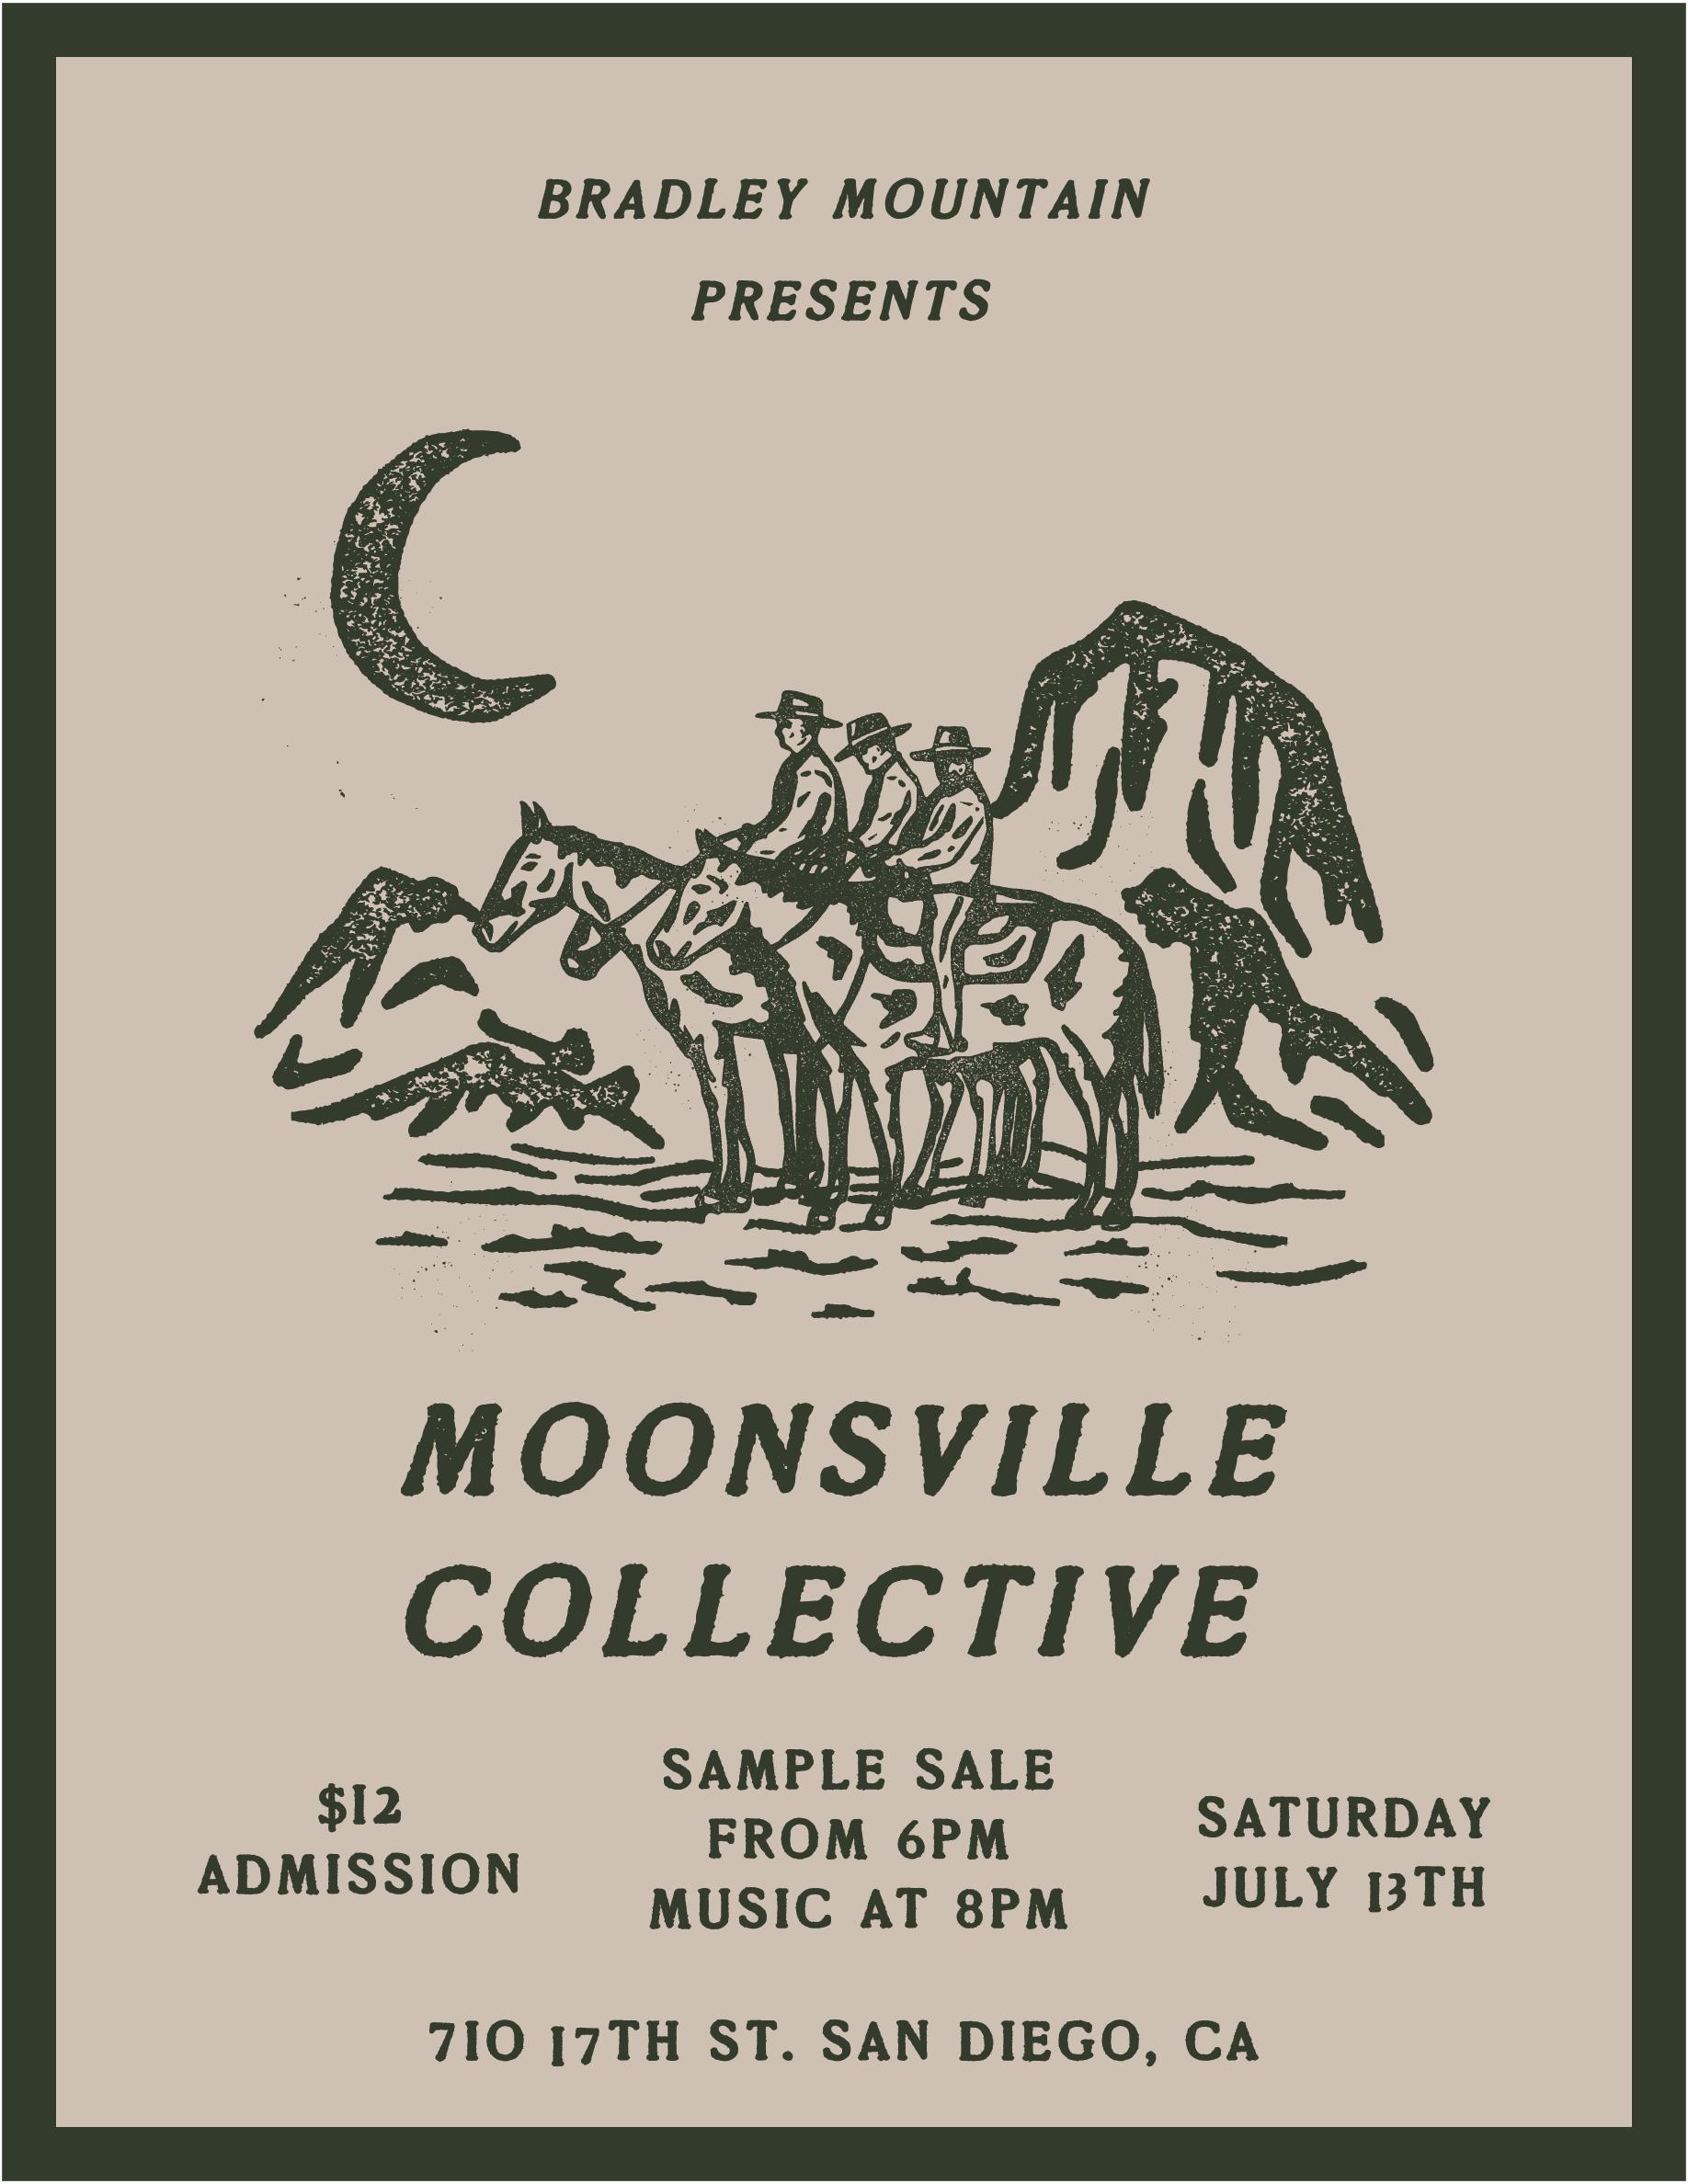 MoonsvilleCollective@3x.png